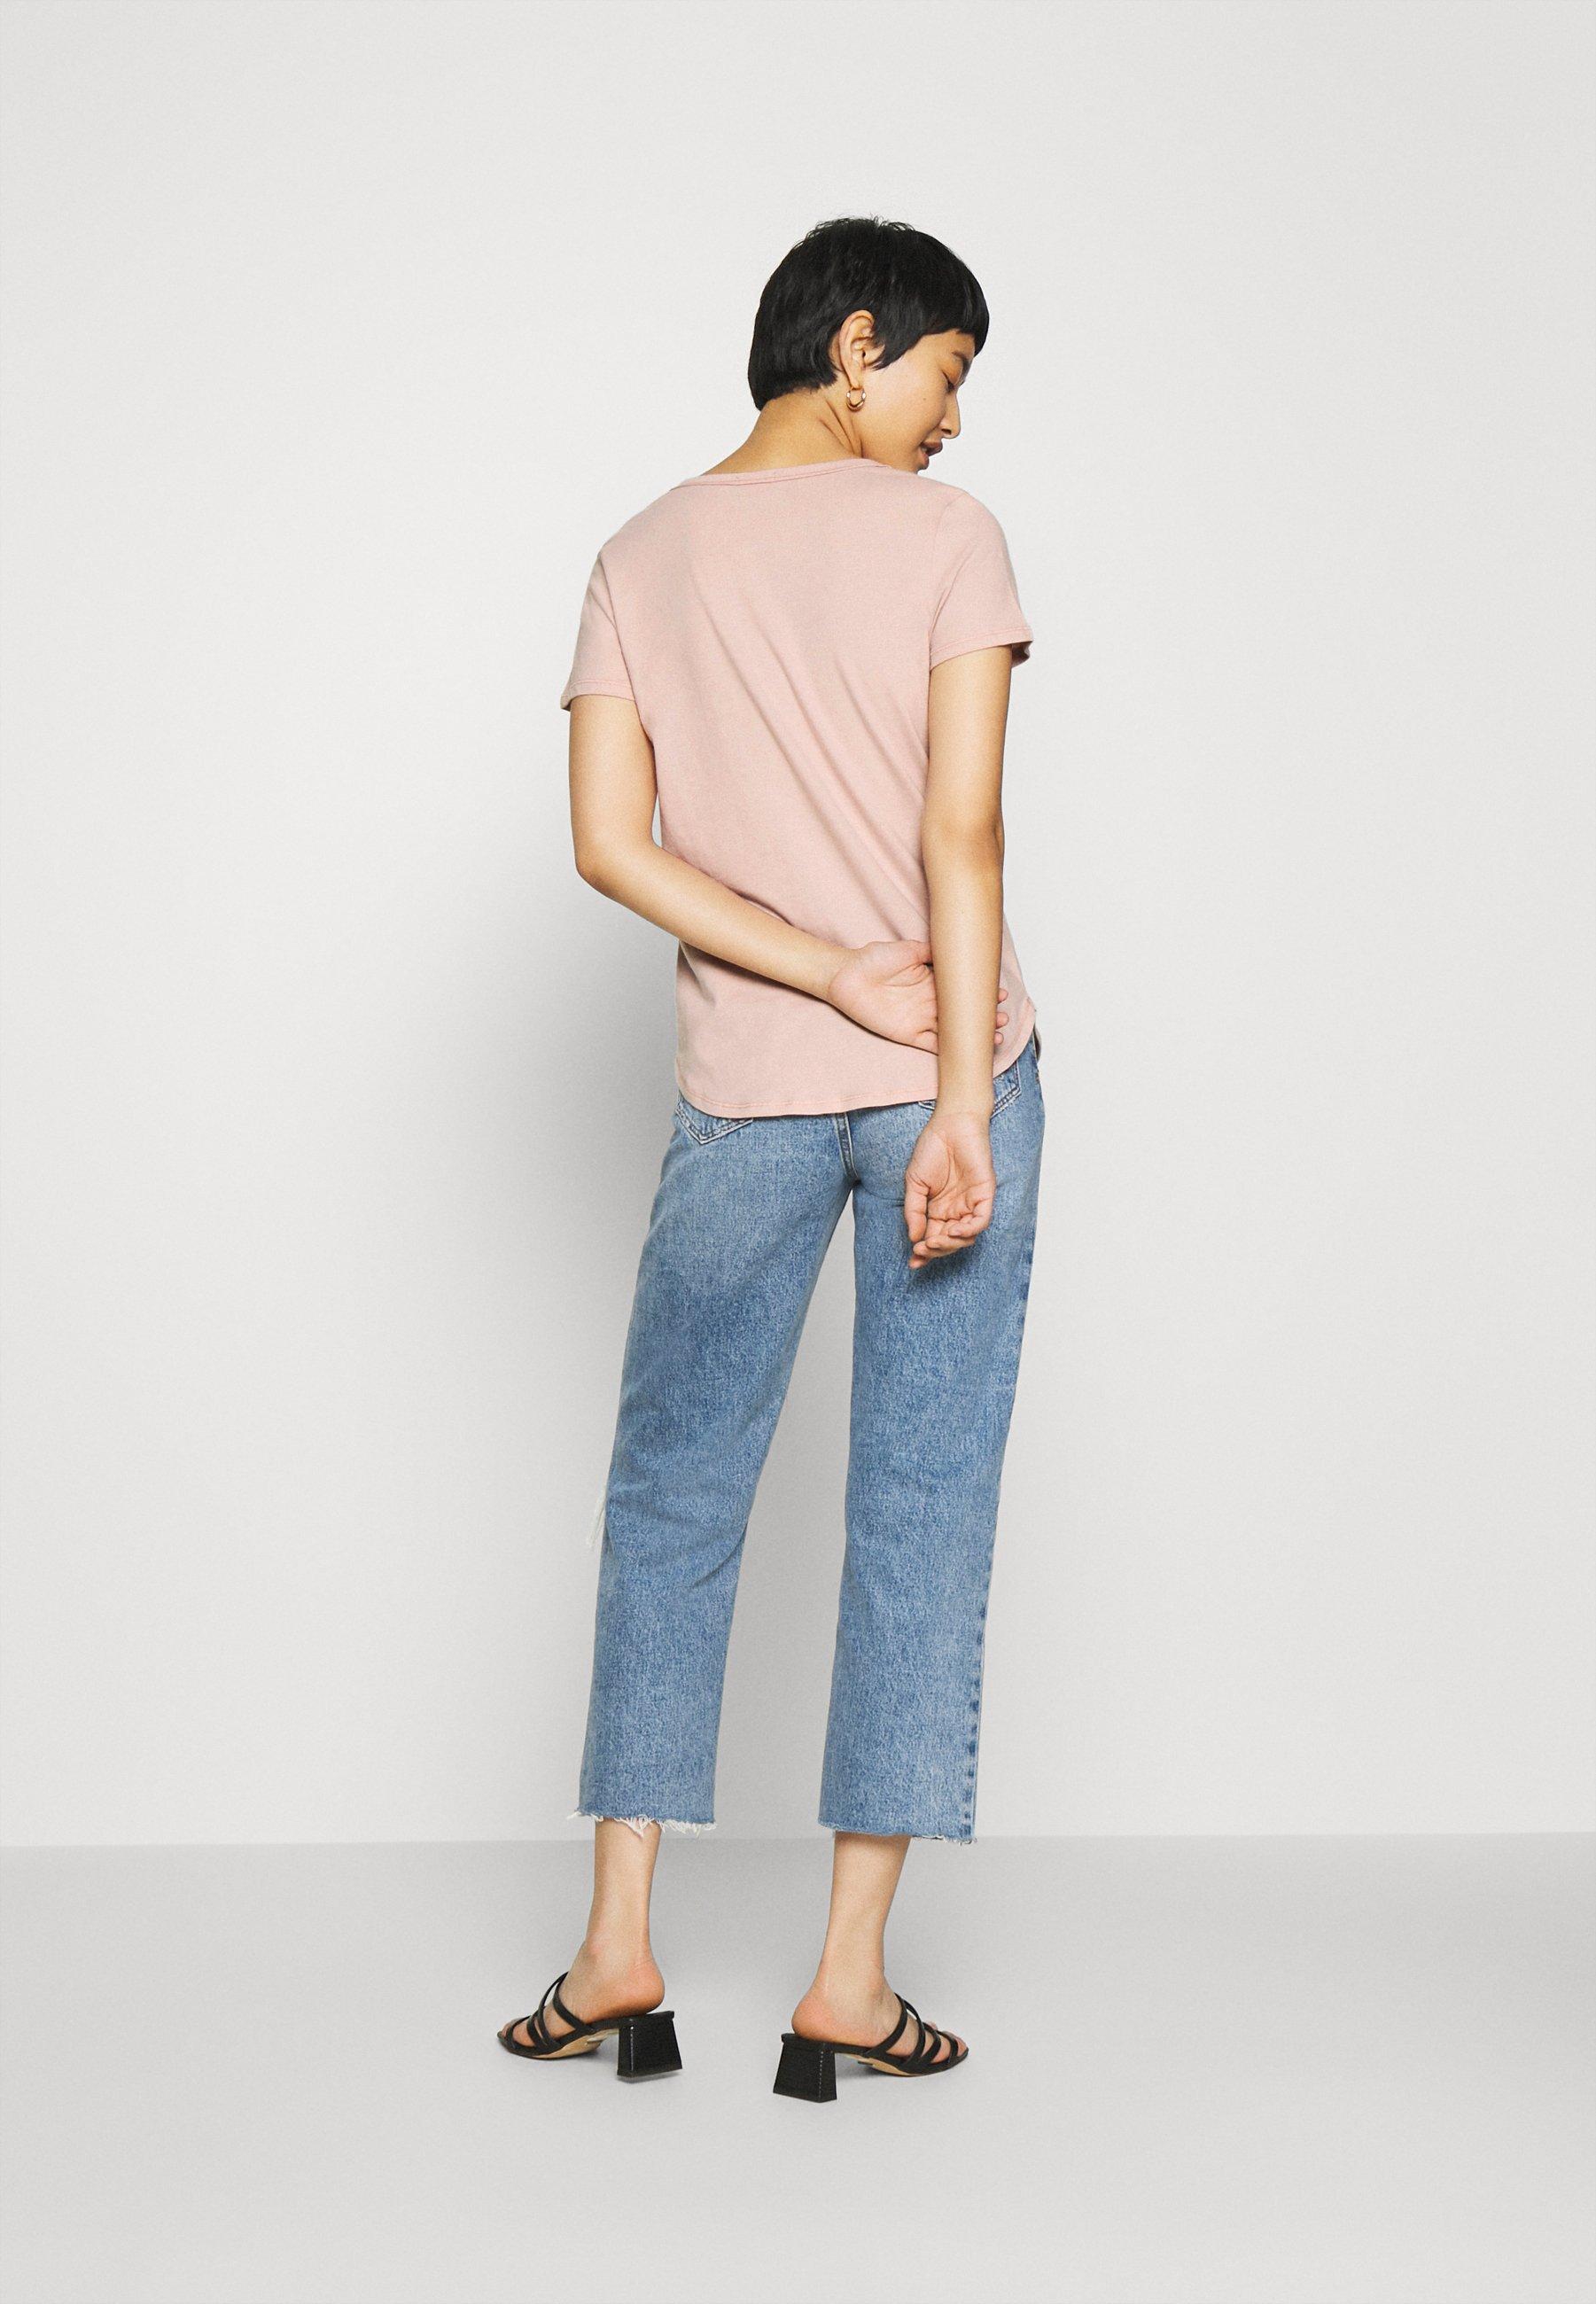 Abercrombie & Fitch 5 PACK - T-shirt basic - white/black/pink/olive/navy - Abbigliamento da donna Veramente